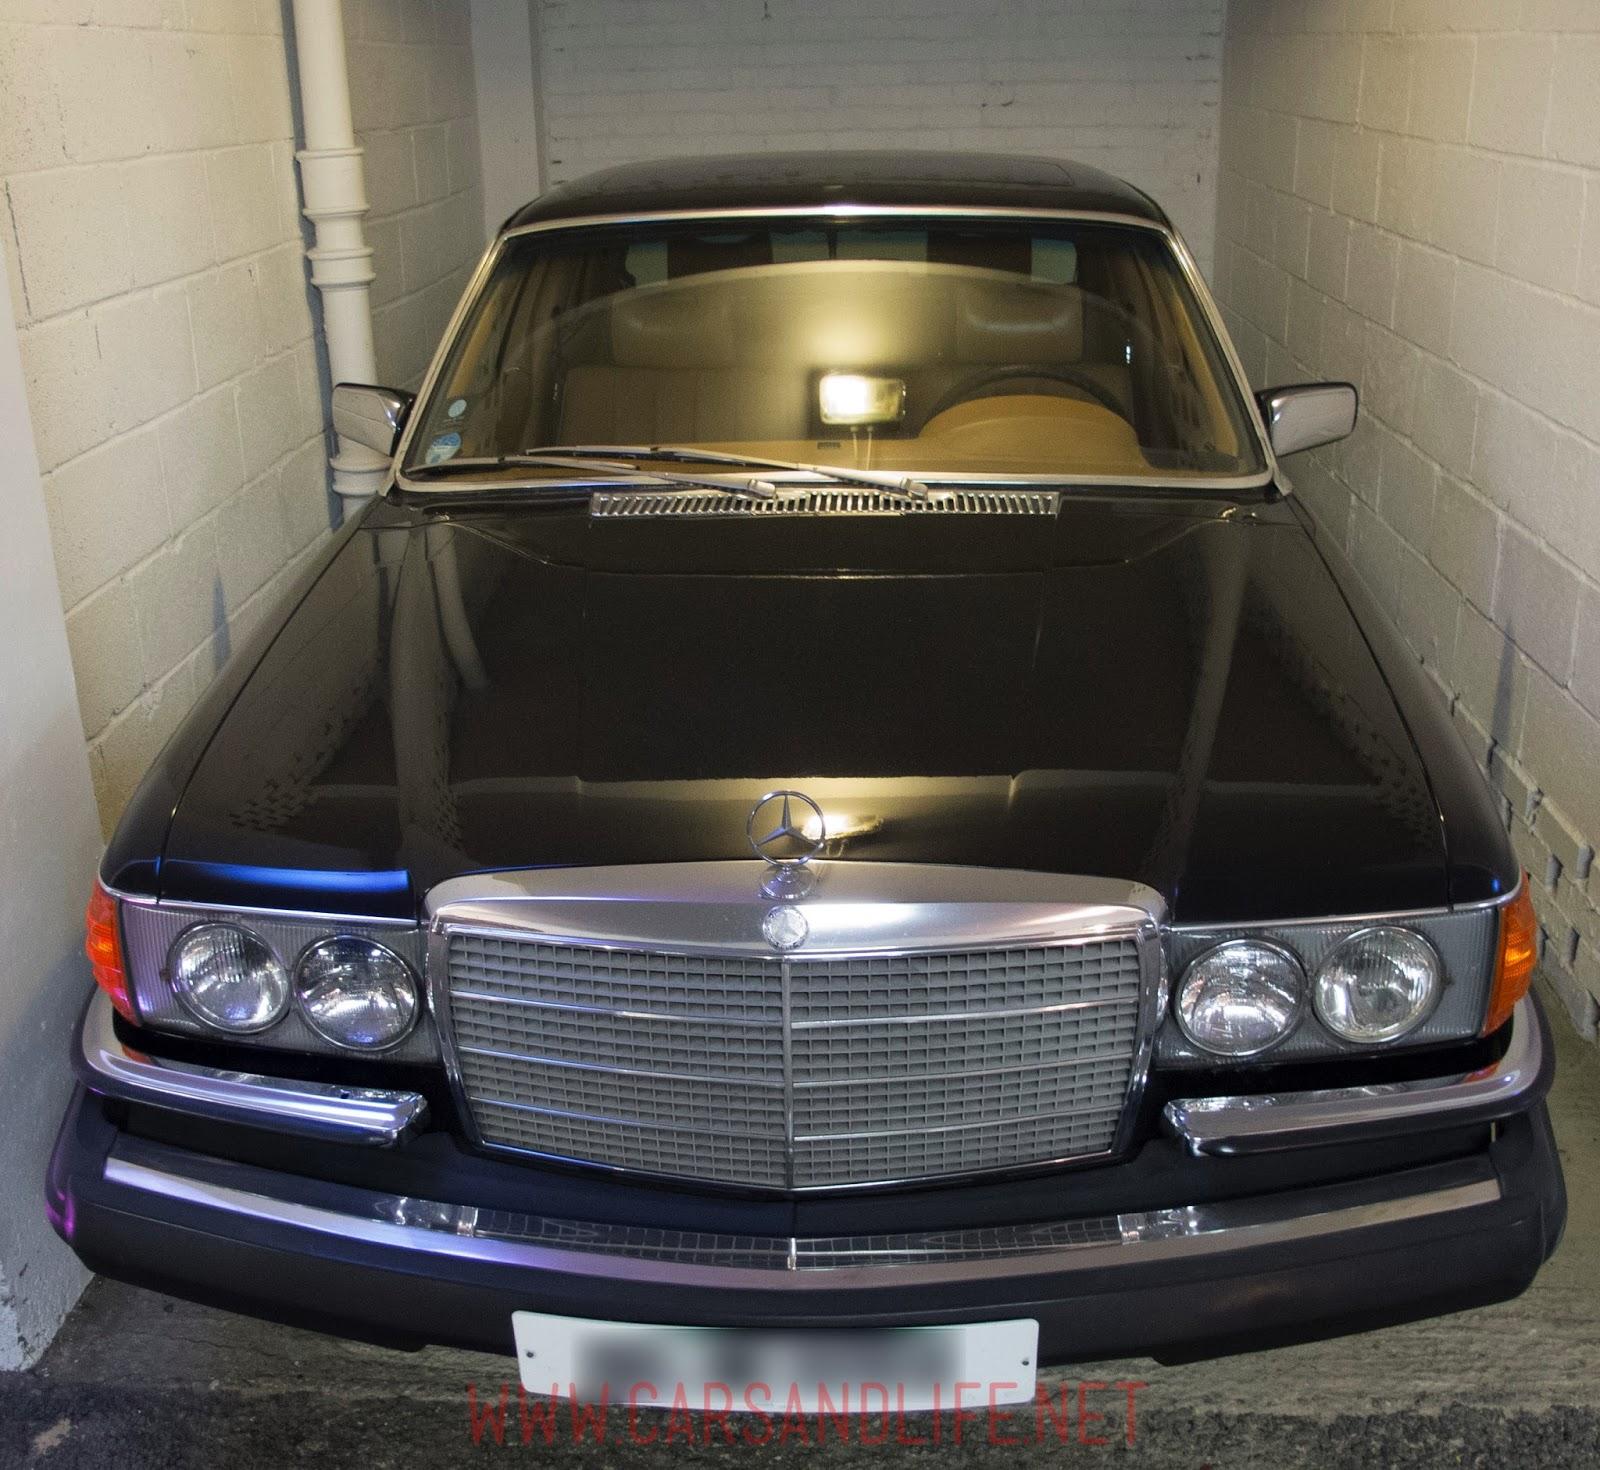 Mercedes 450SEL 6.9 | Classic Car Club London - cars & life | cars ...